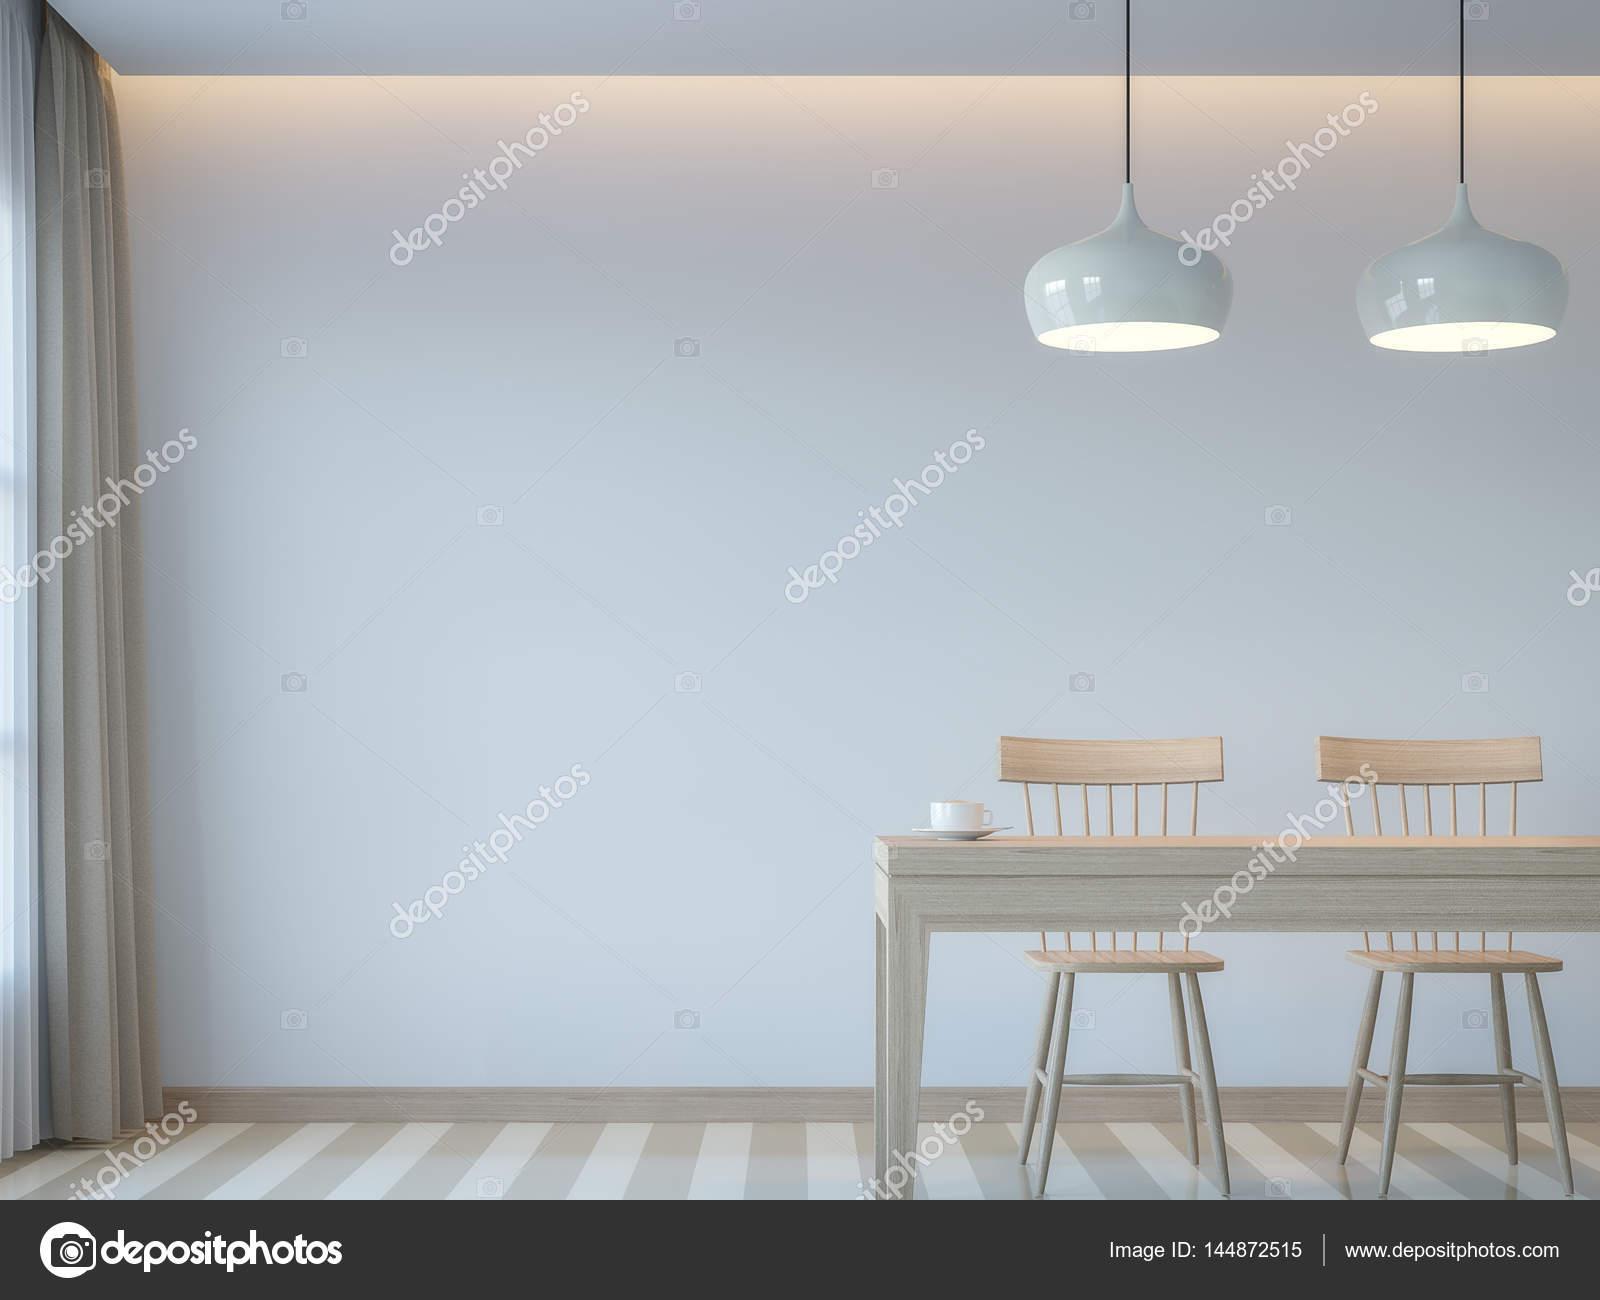 Comedor blanco moderno estilo minimalista render 3d imagen for Comedor estilo minimalista